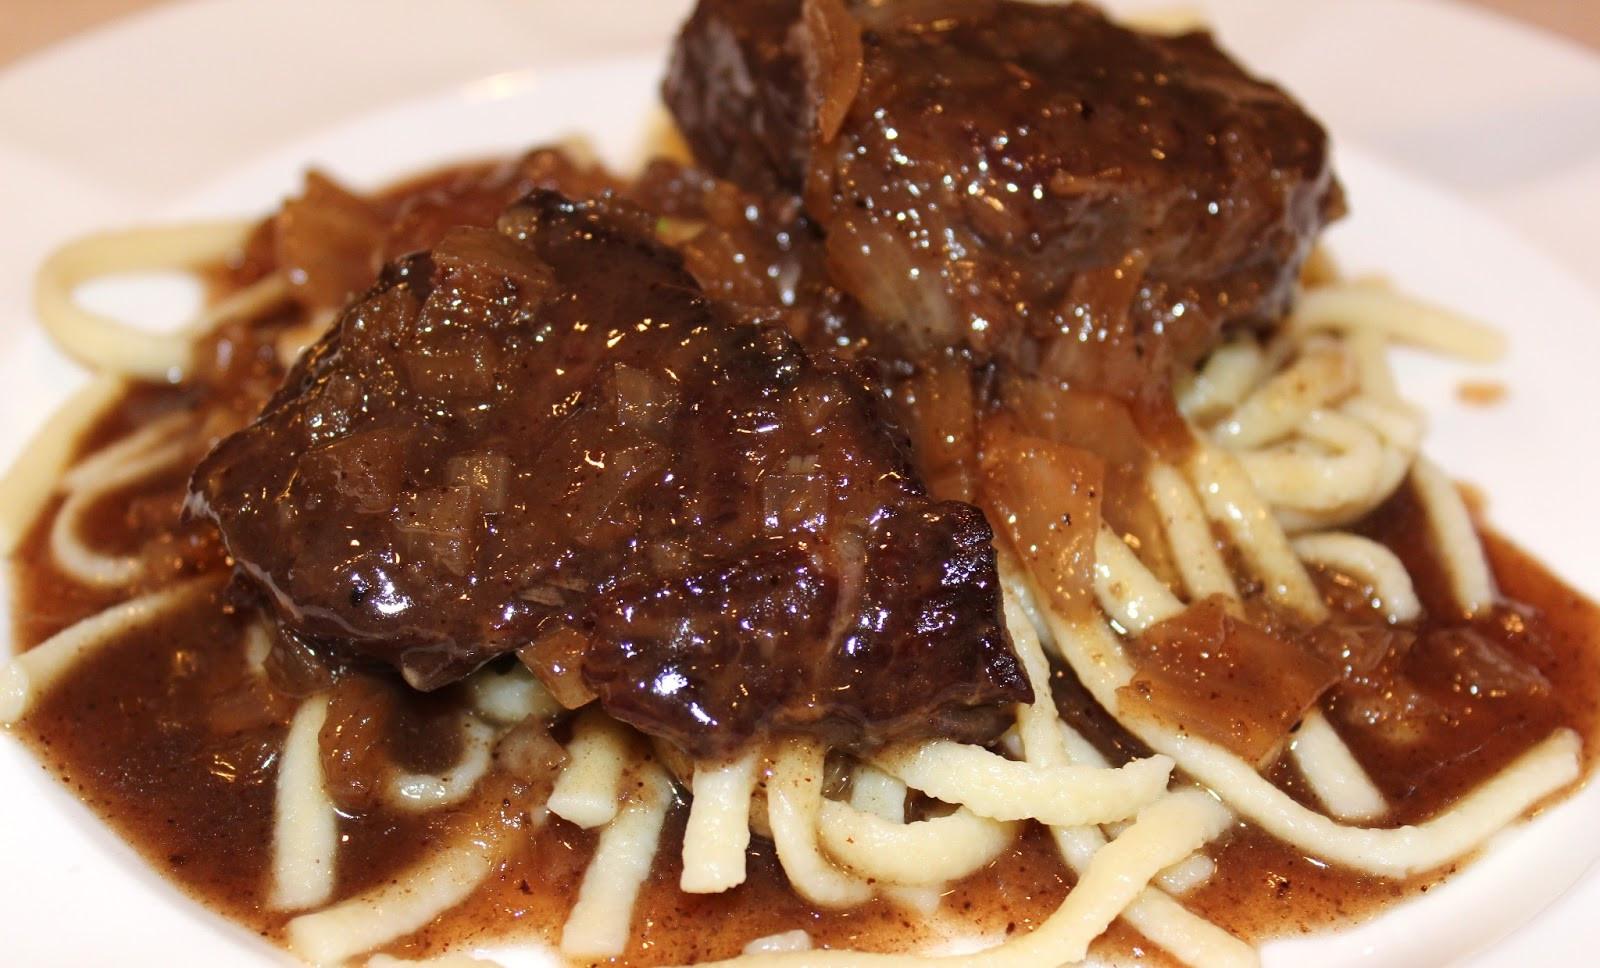 Crockpot Beef Short Ribs  Hey Mom What s For Dinner Crock Pot Boneless Beef